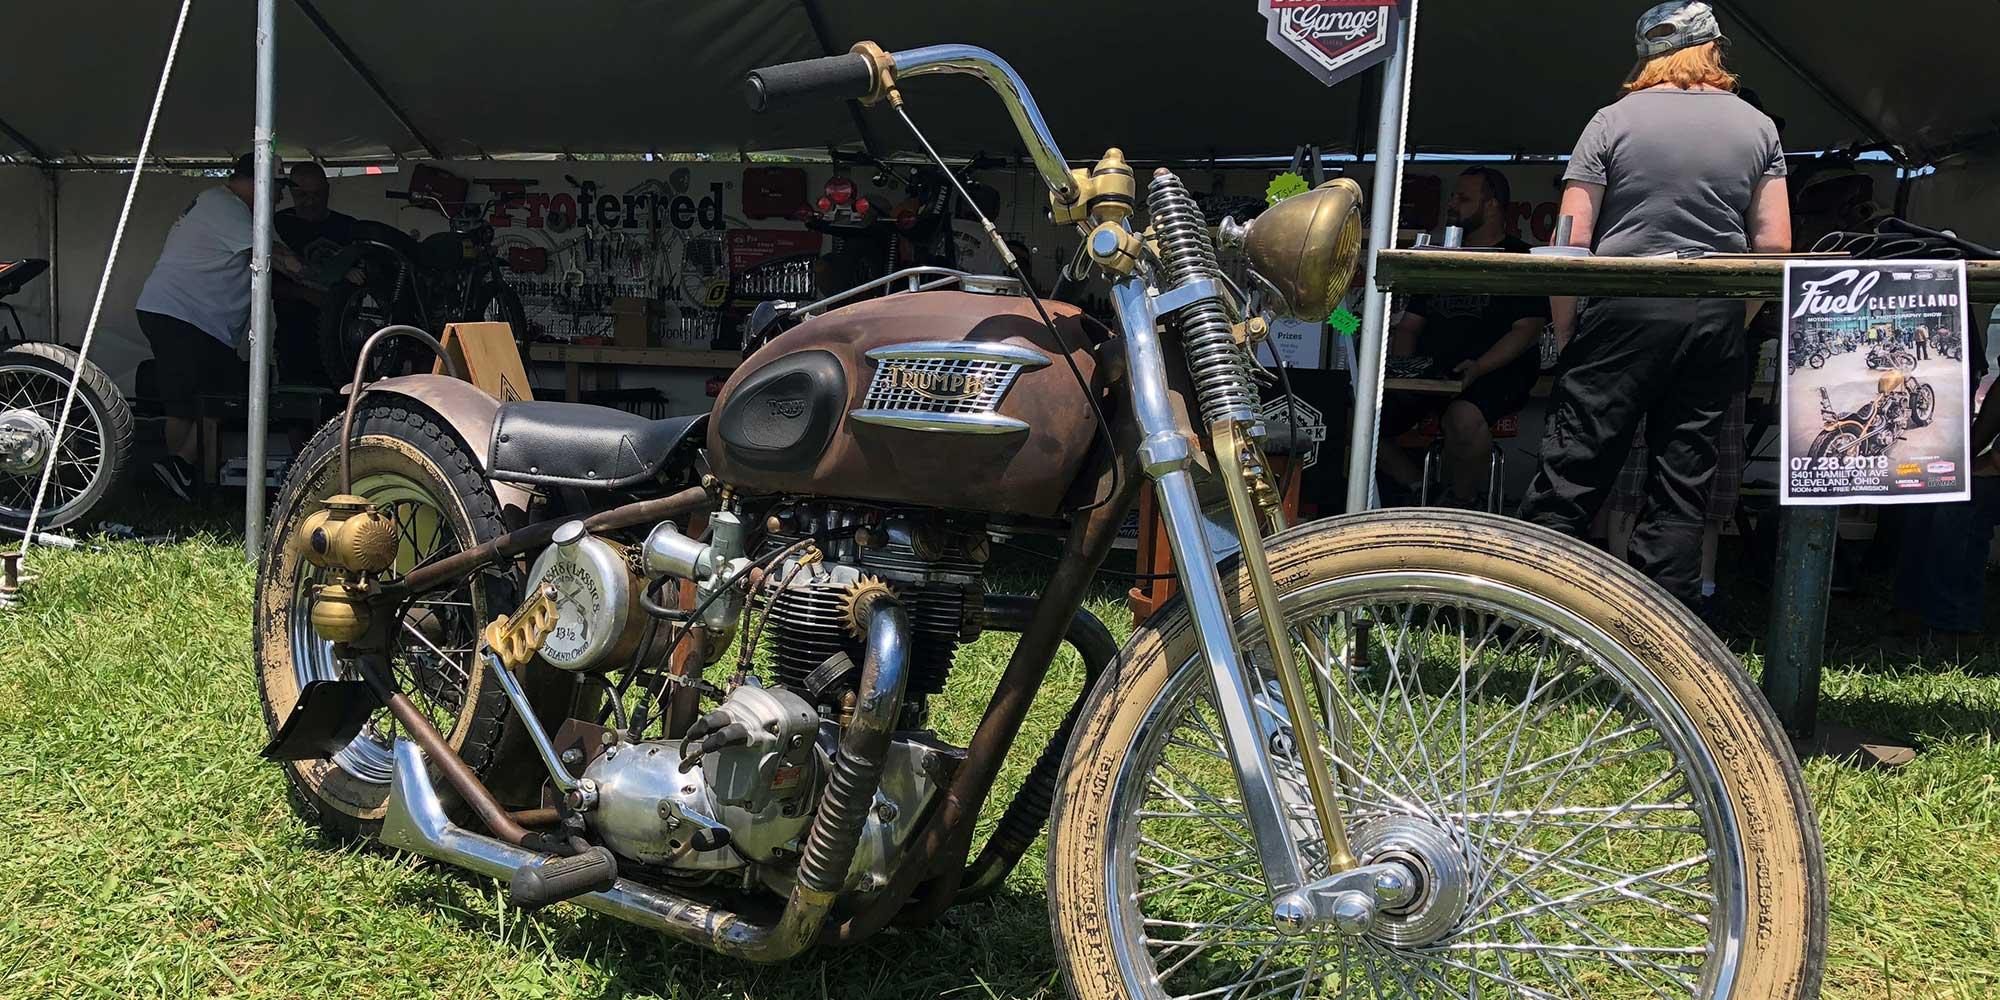 Vintage Triumph Spring - AMA Vintage Motorcycle Days